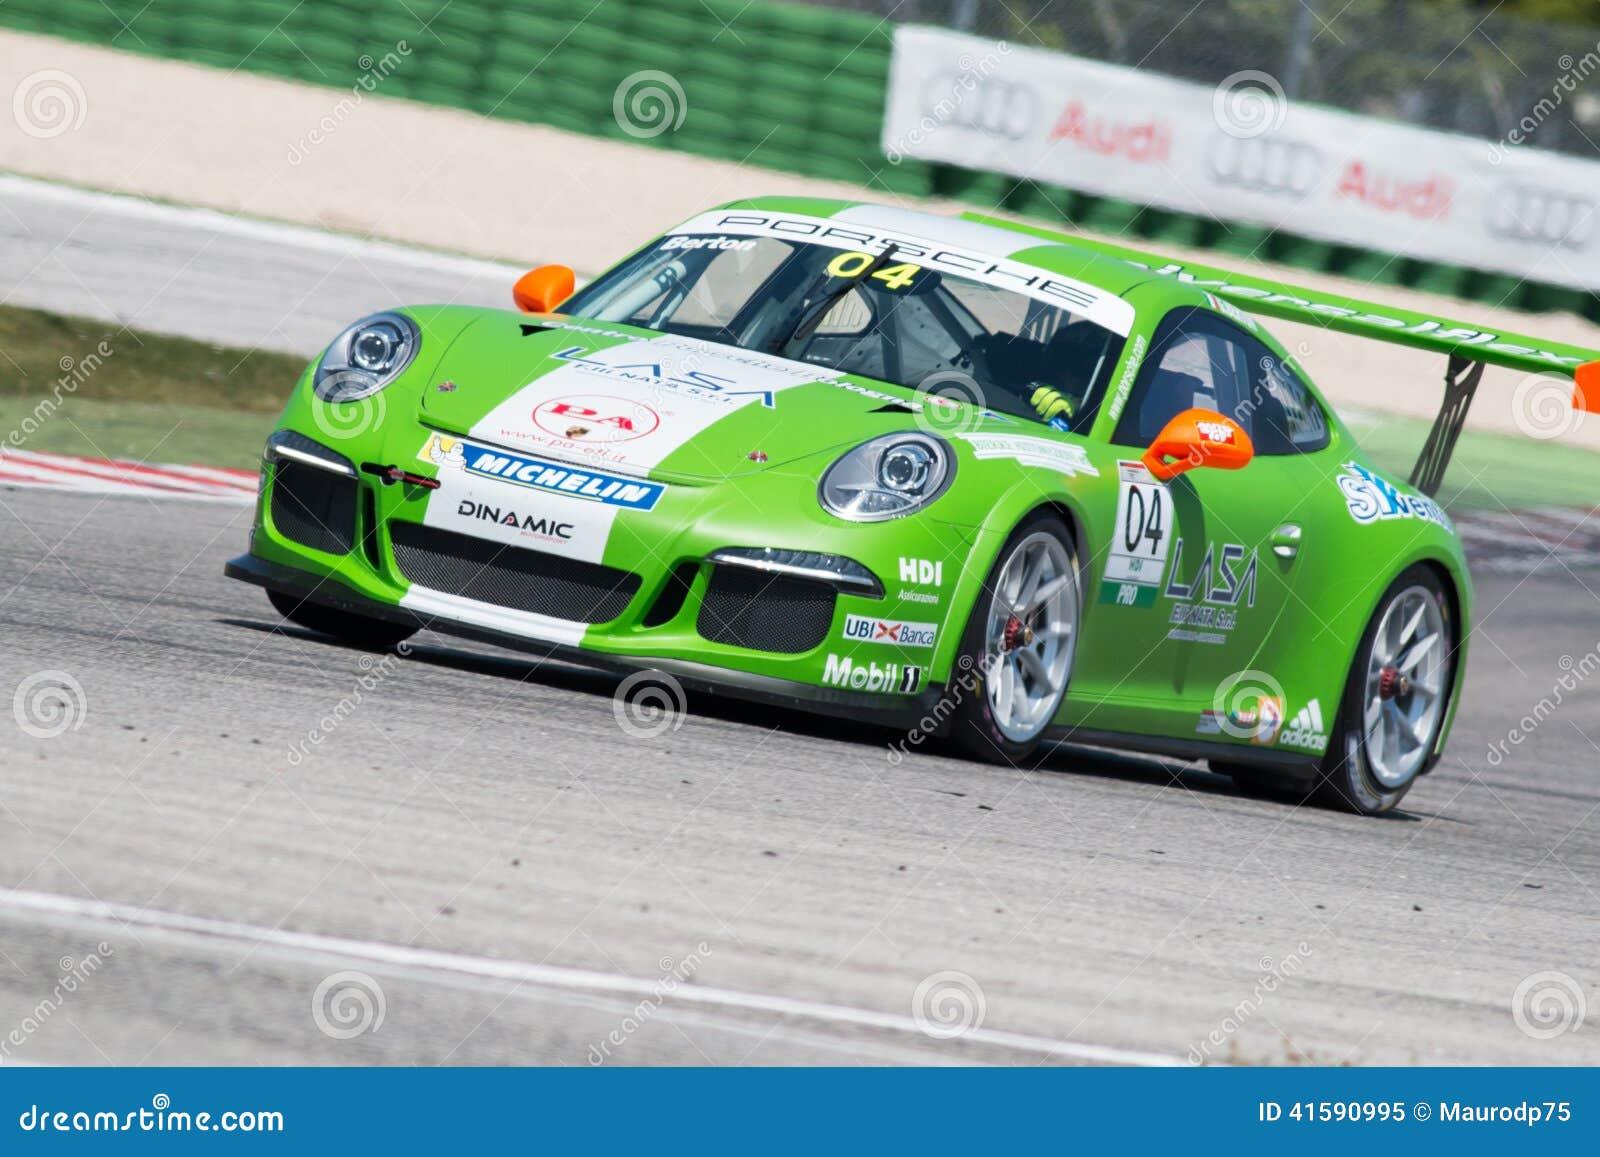 Porsche 911 Gt3 Cup Race Car Editorial Image Image Of Sport